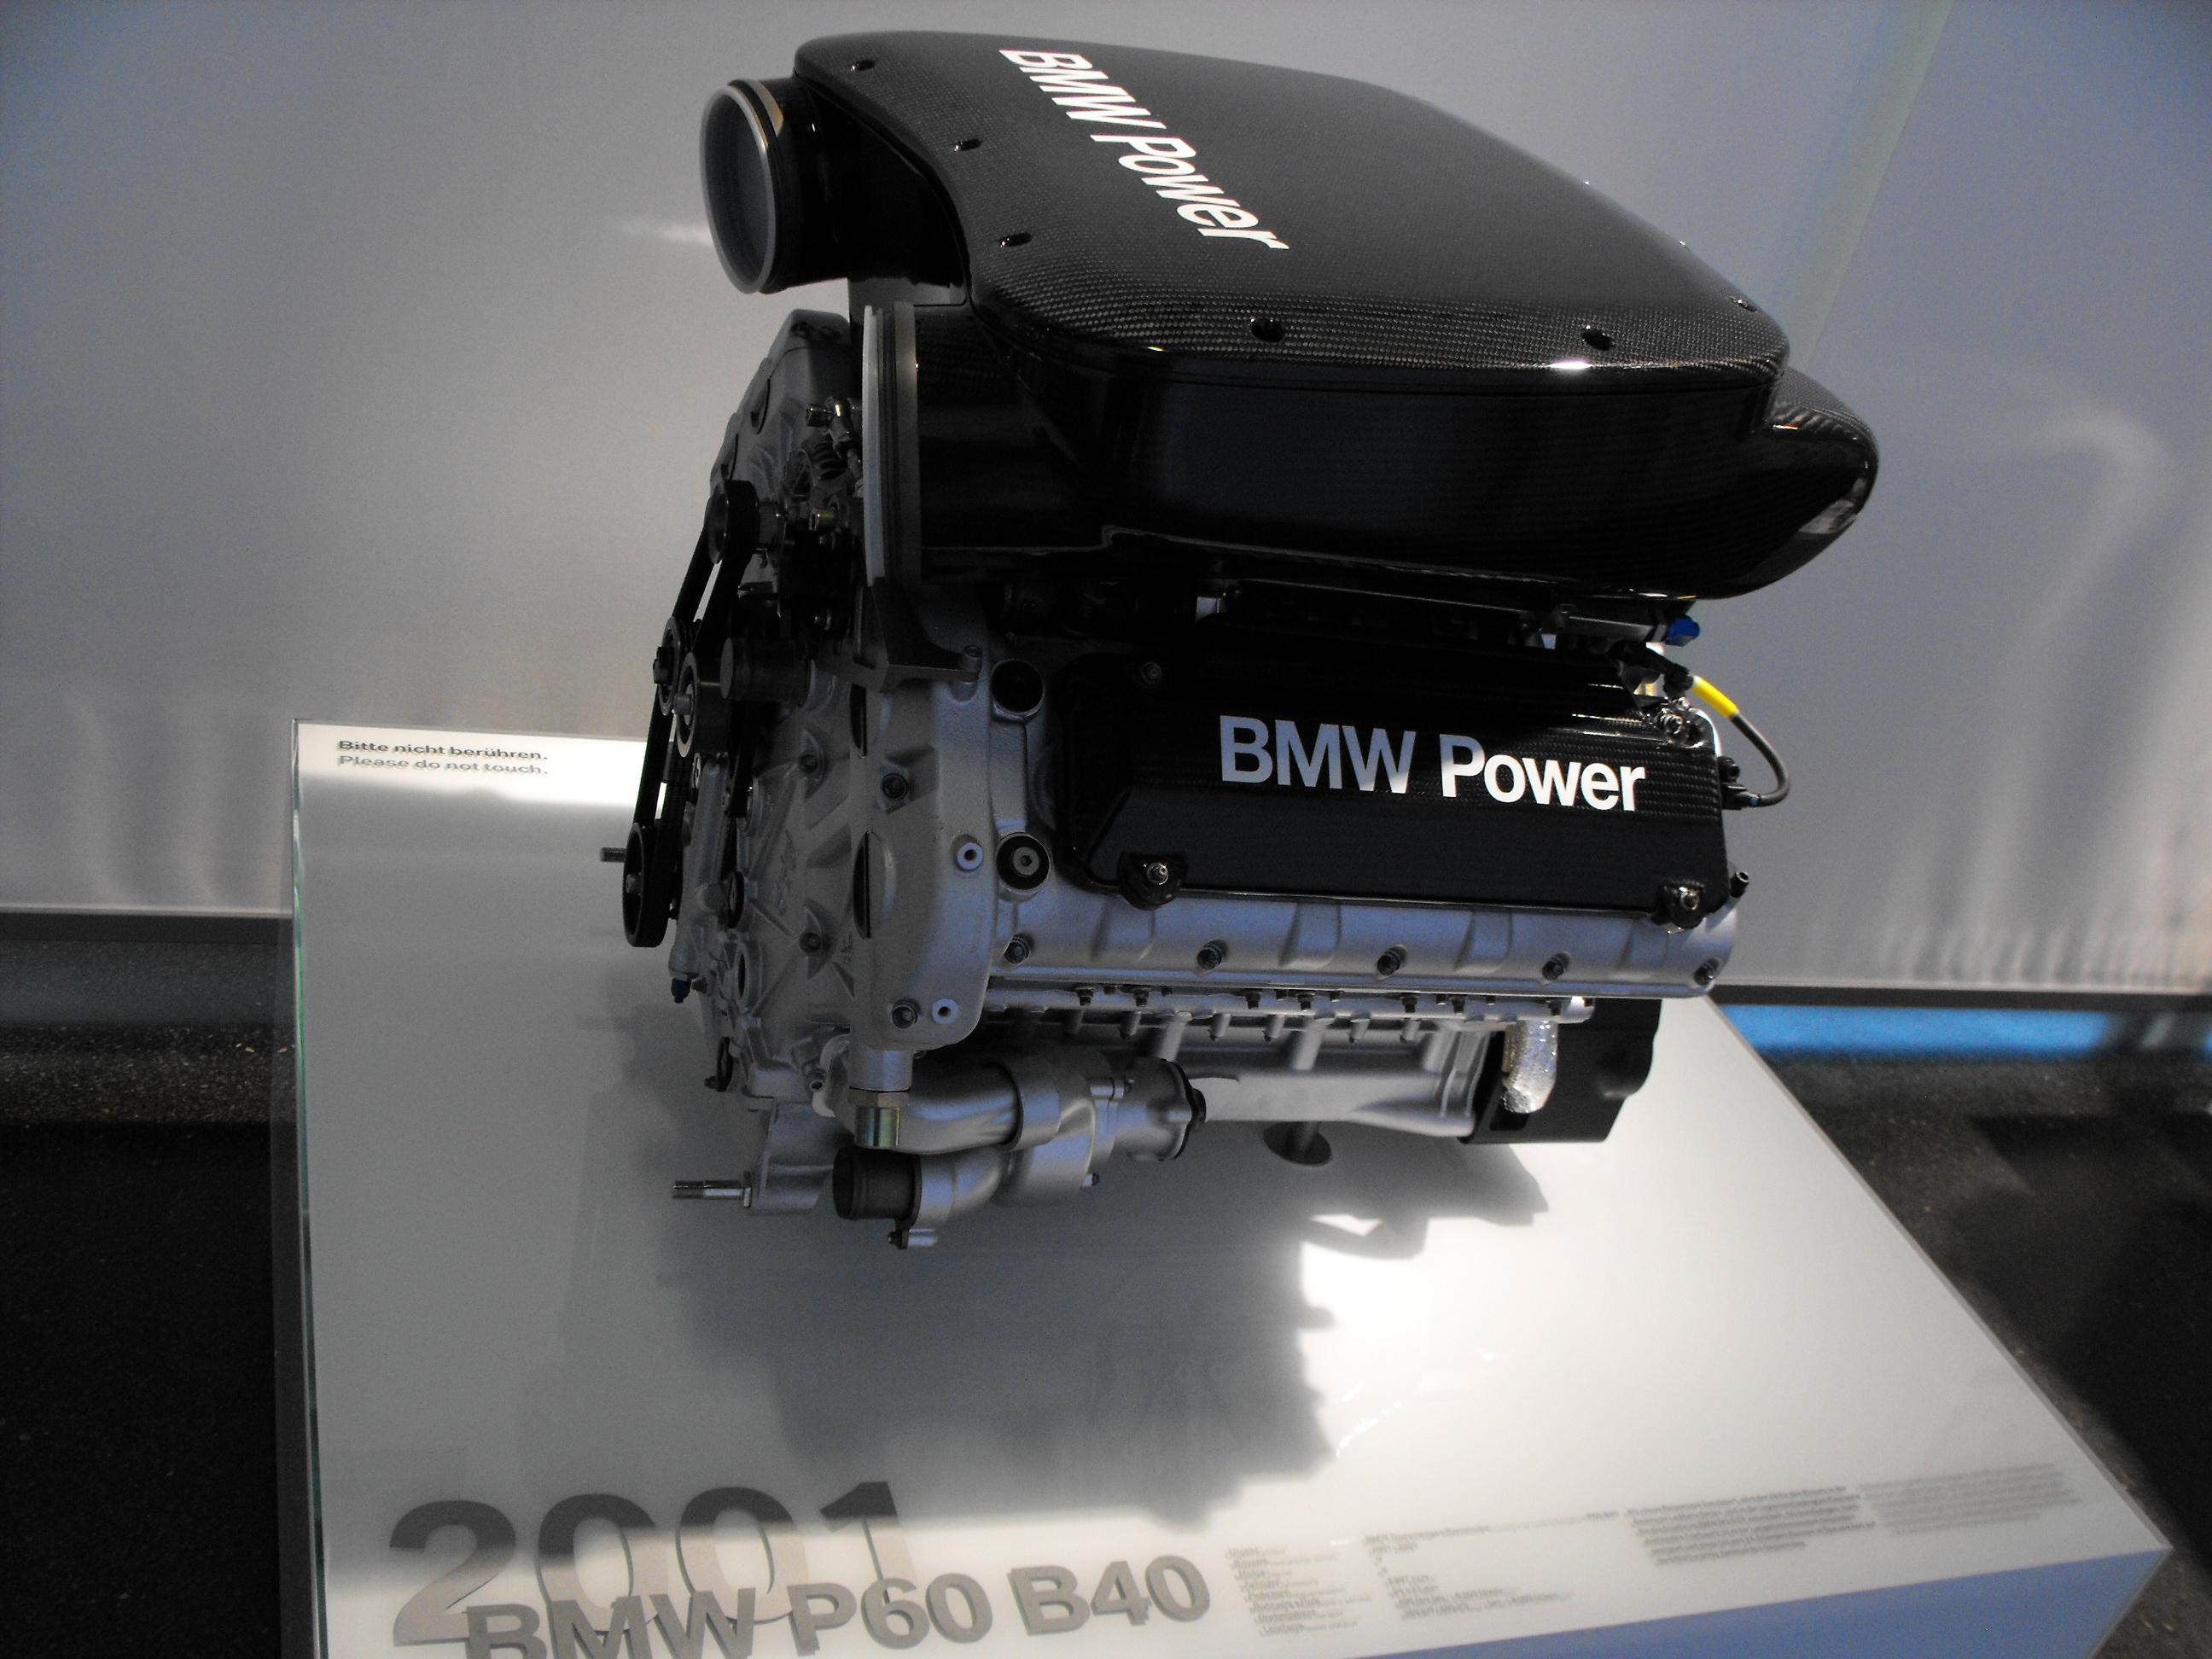 BMW_P60_B40.jpg